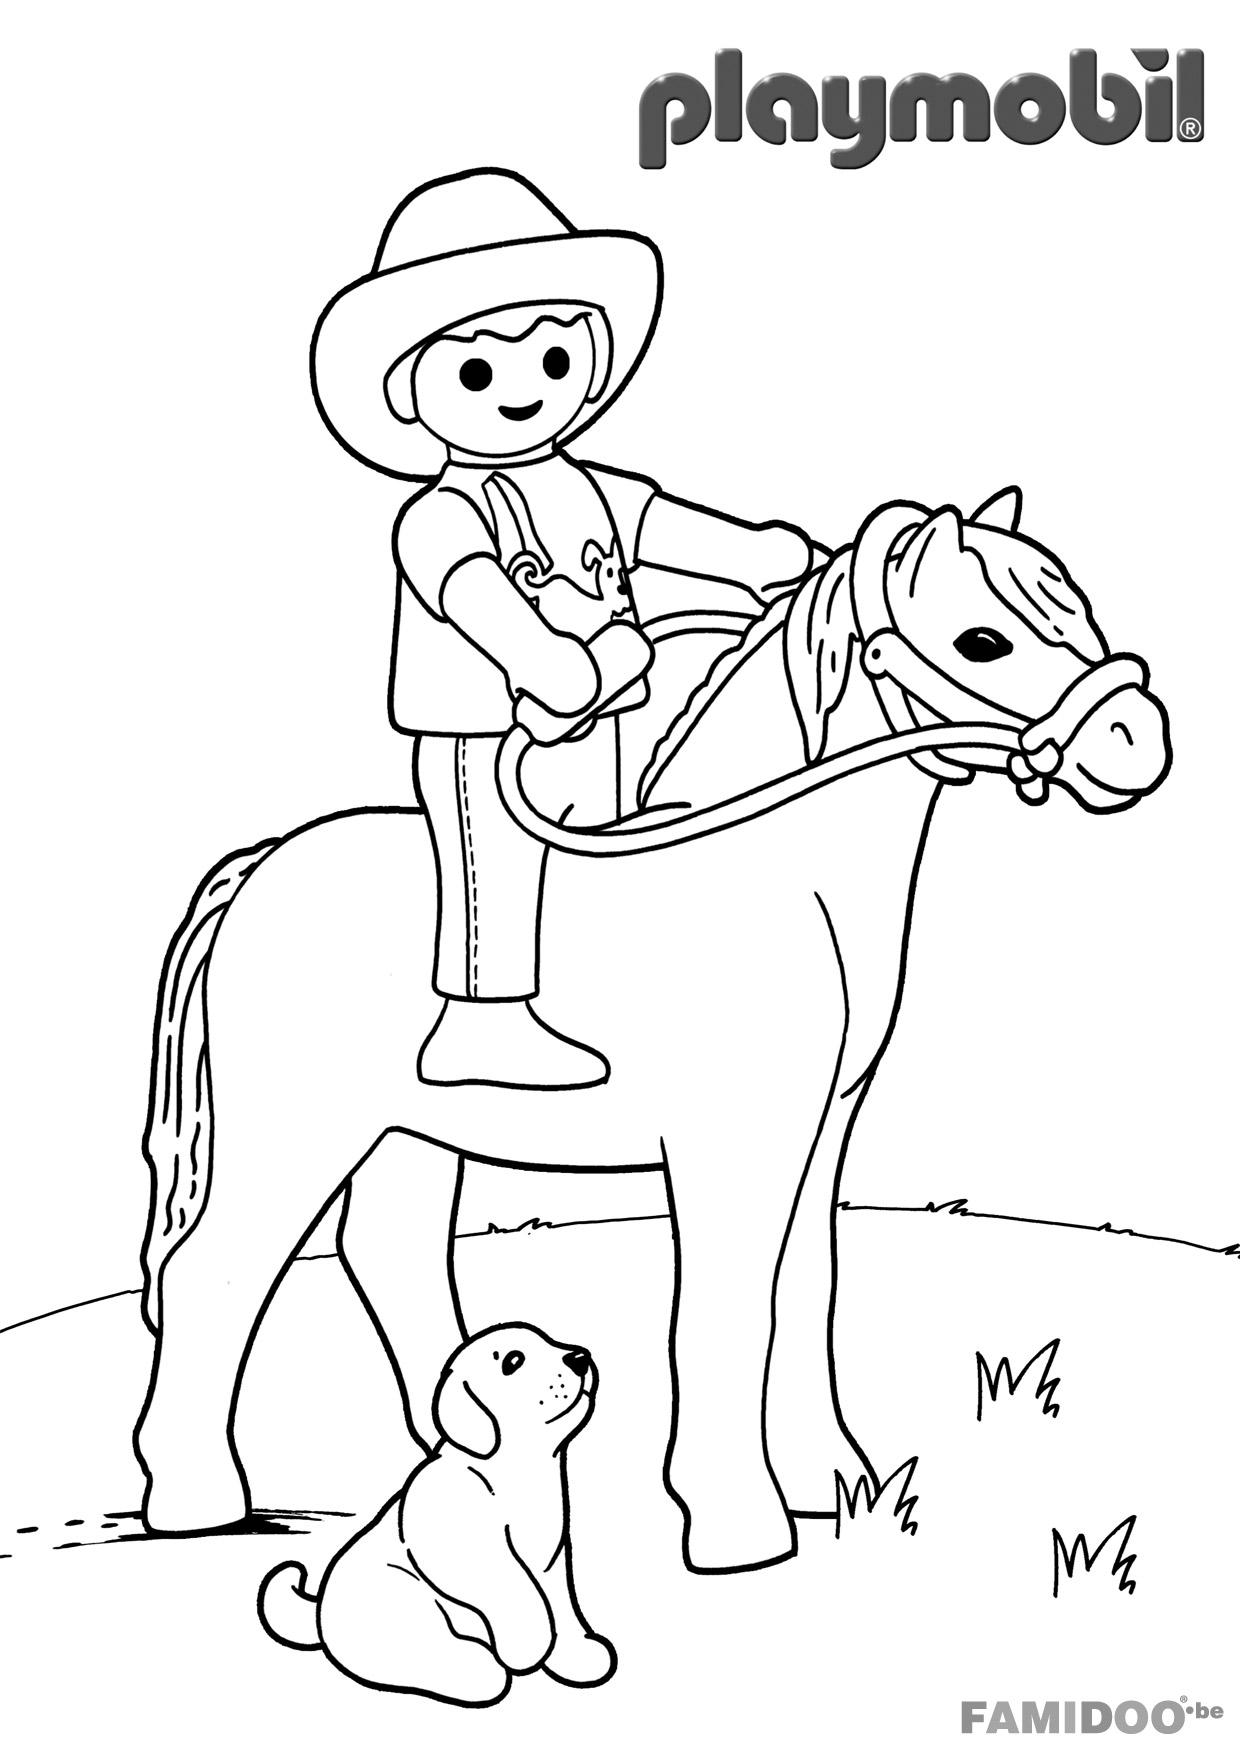 Coloriage playmobil cowboy coloriage playmobil - Image coloriage ...